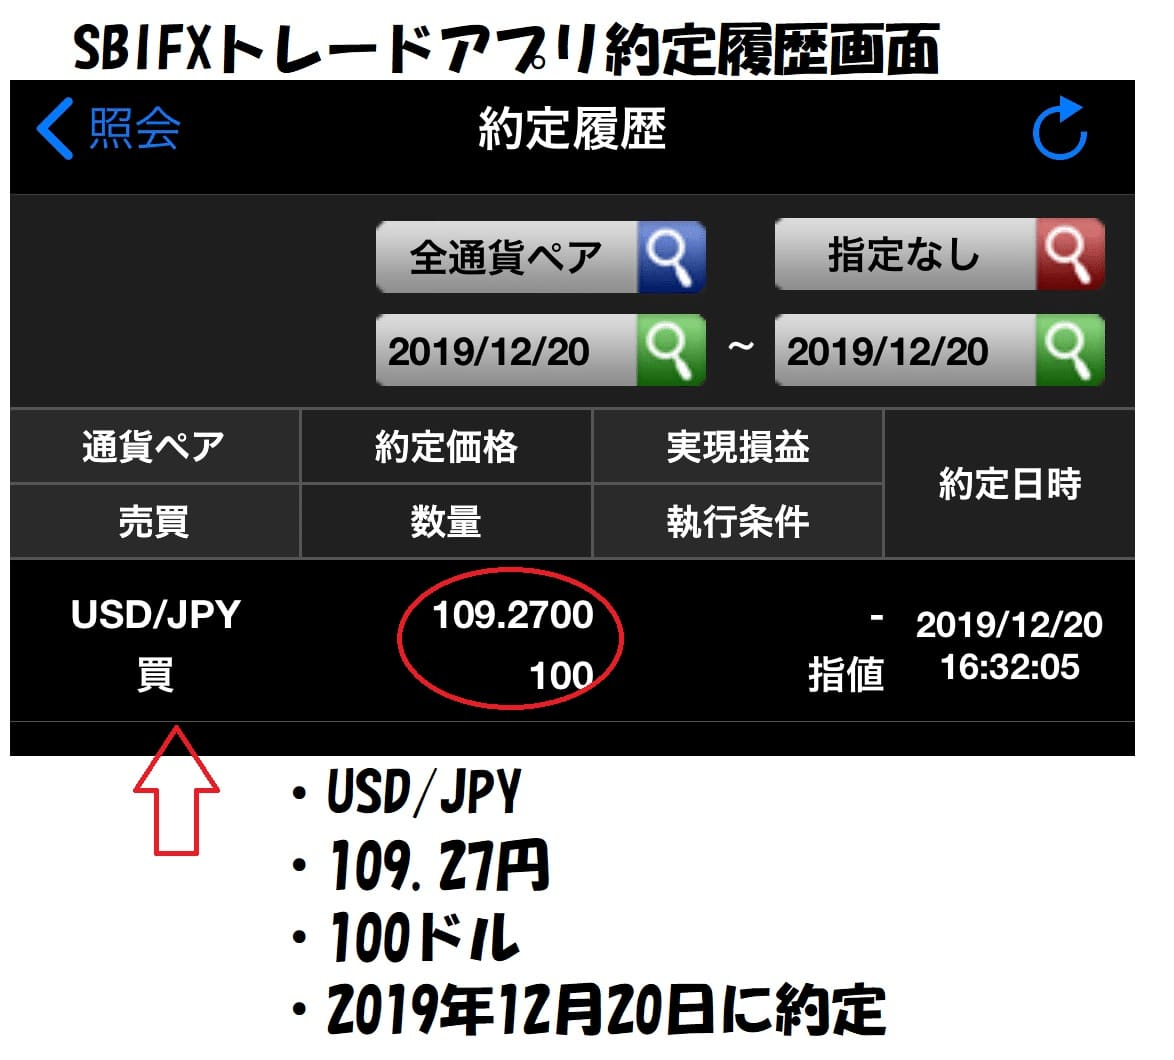 SBIFXトレードアプリ約定履歴